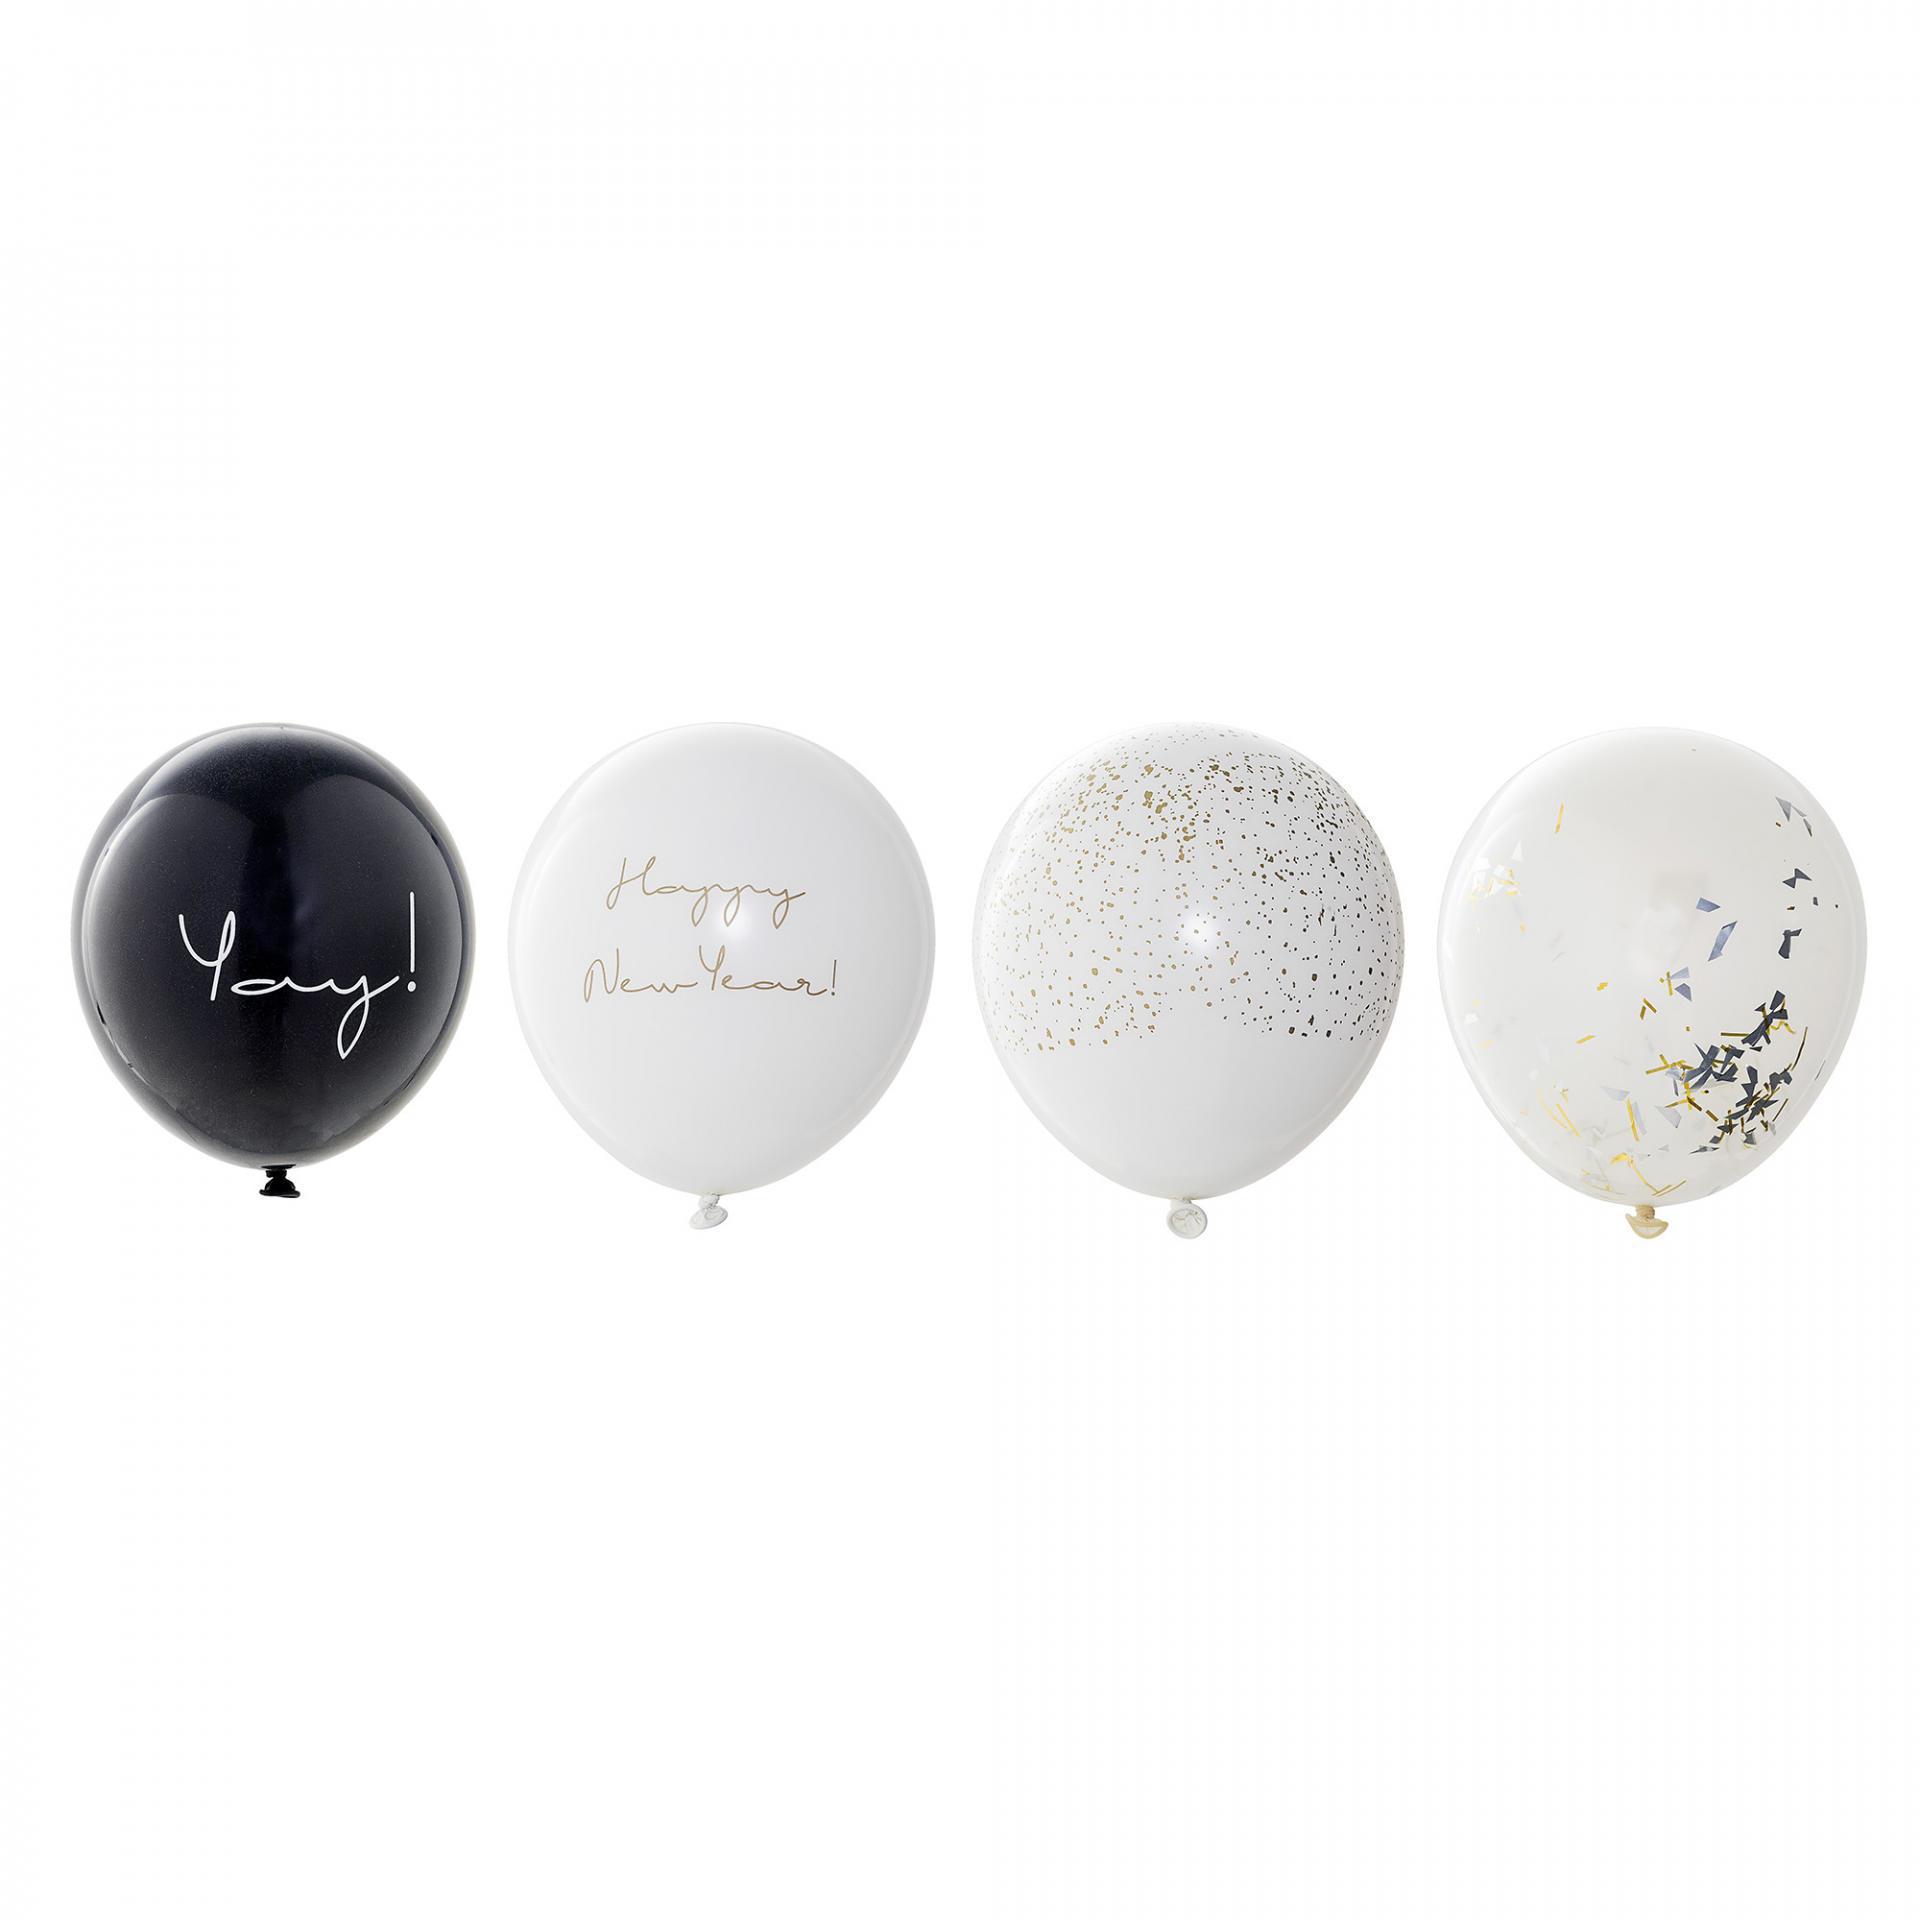 Bloomingville Nafukovací balónky Happy New Year set 24 ks, černá barva, bílá barva, čirá barva